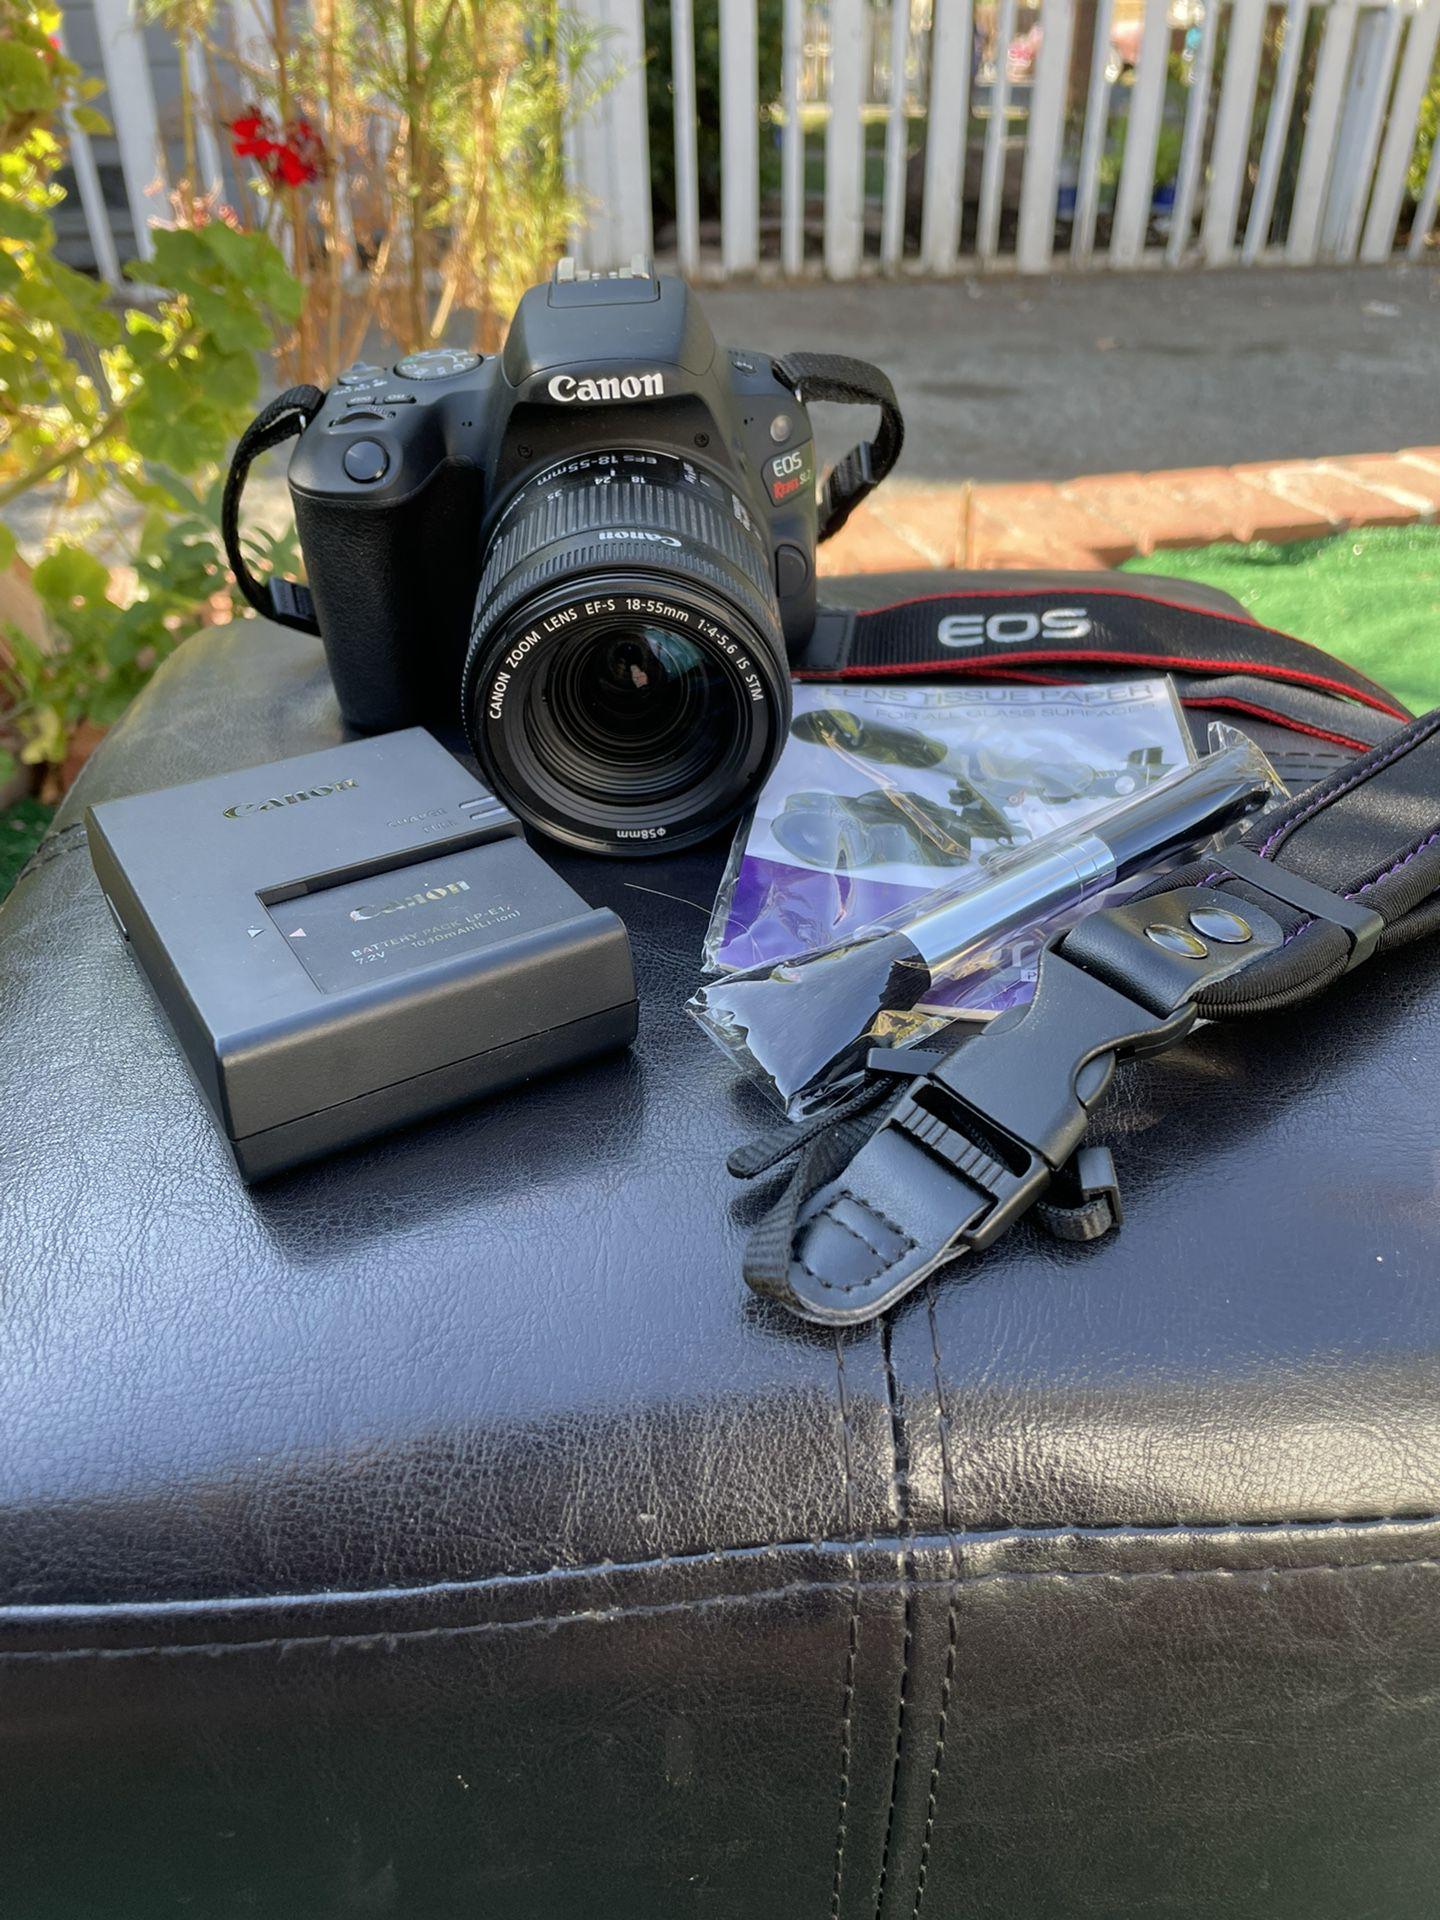 Canon EOS Rebel SL2 DSLR Camera with EF-S 18-55mm IS STM Lens in Black